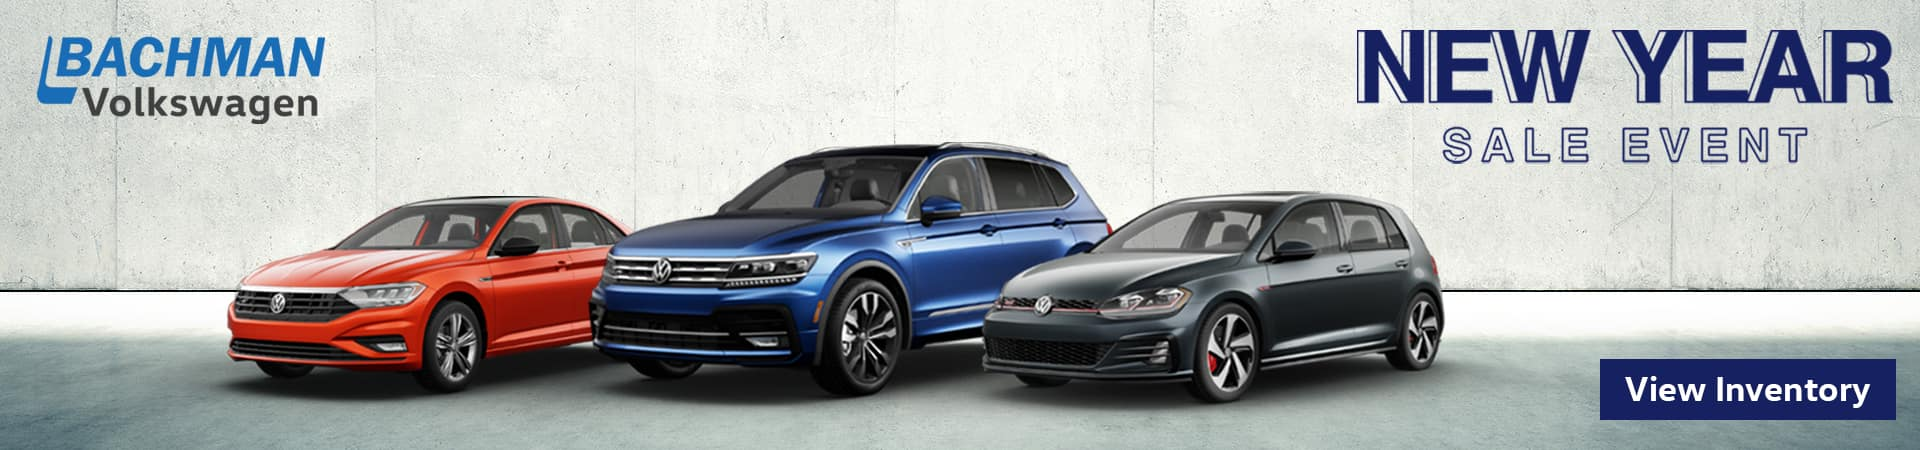 VW-New-Year